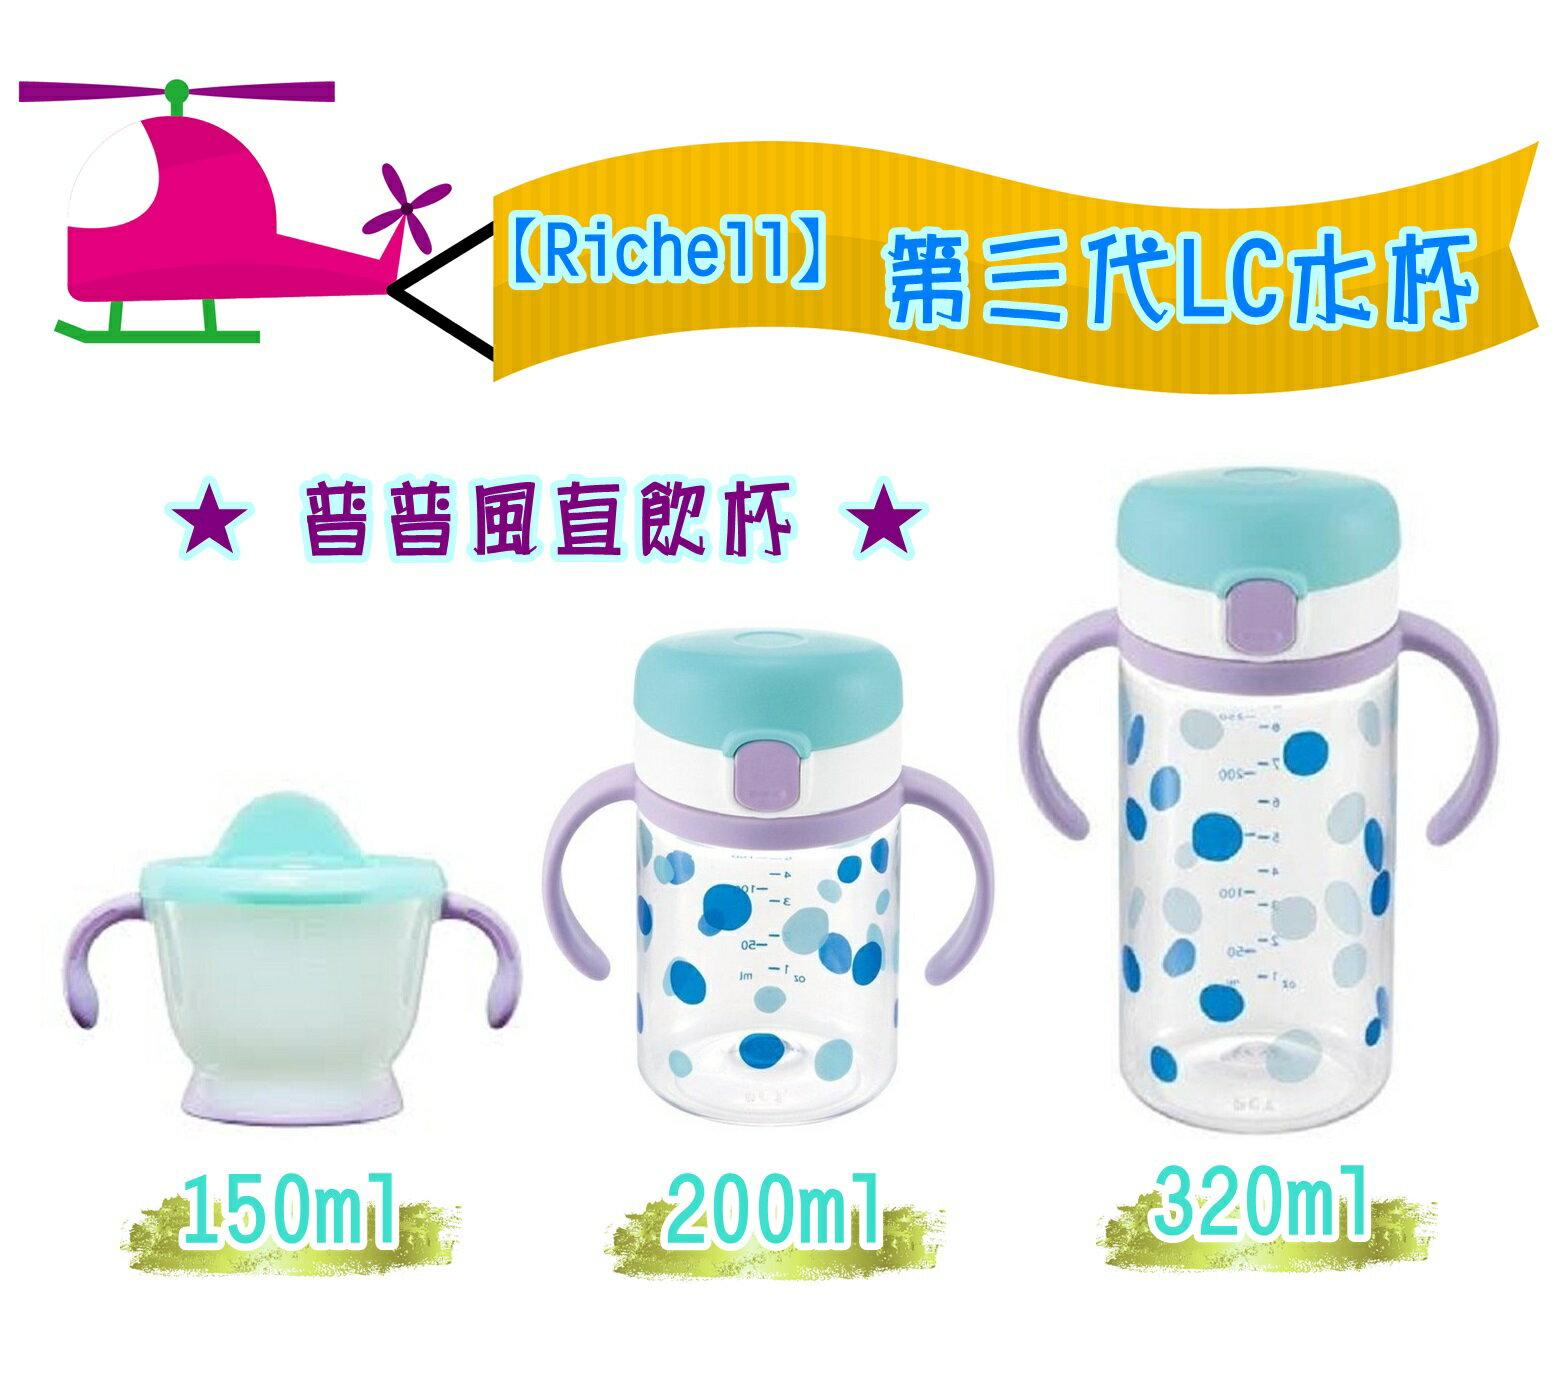 【Richell】利其爾 第三代LC水杯 ★普普風直飲杯★ (150ml/200ml/320ml)